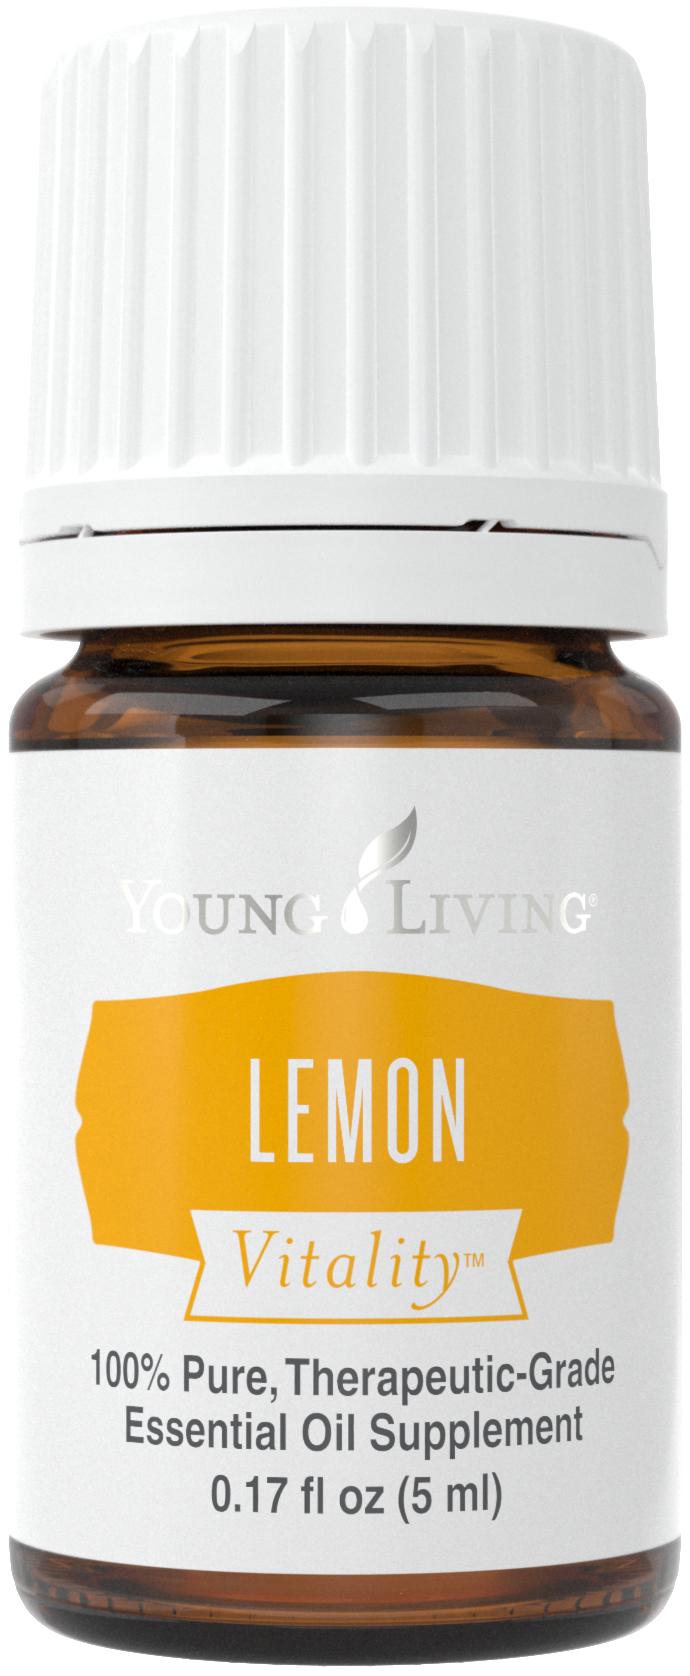 Lemon Vitality.png